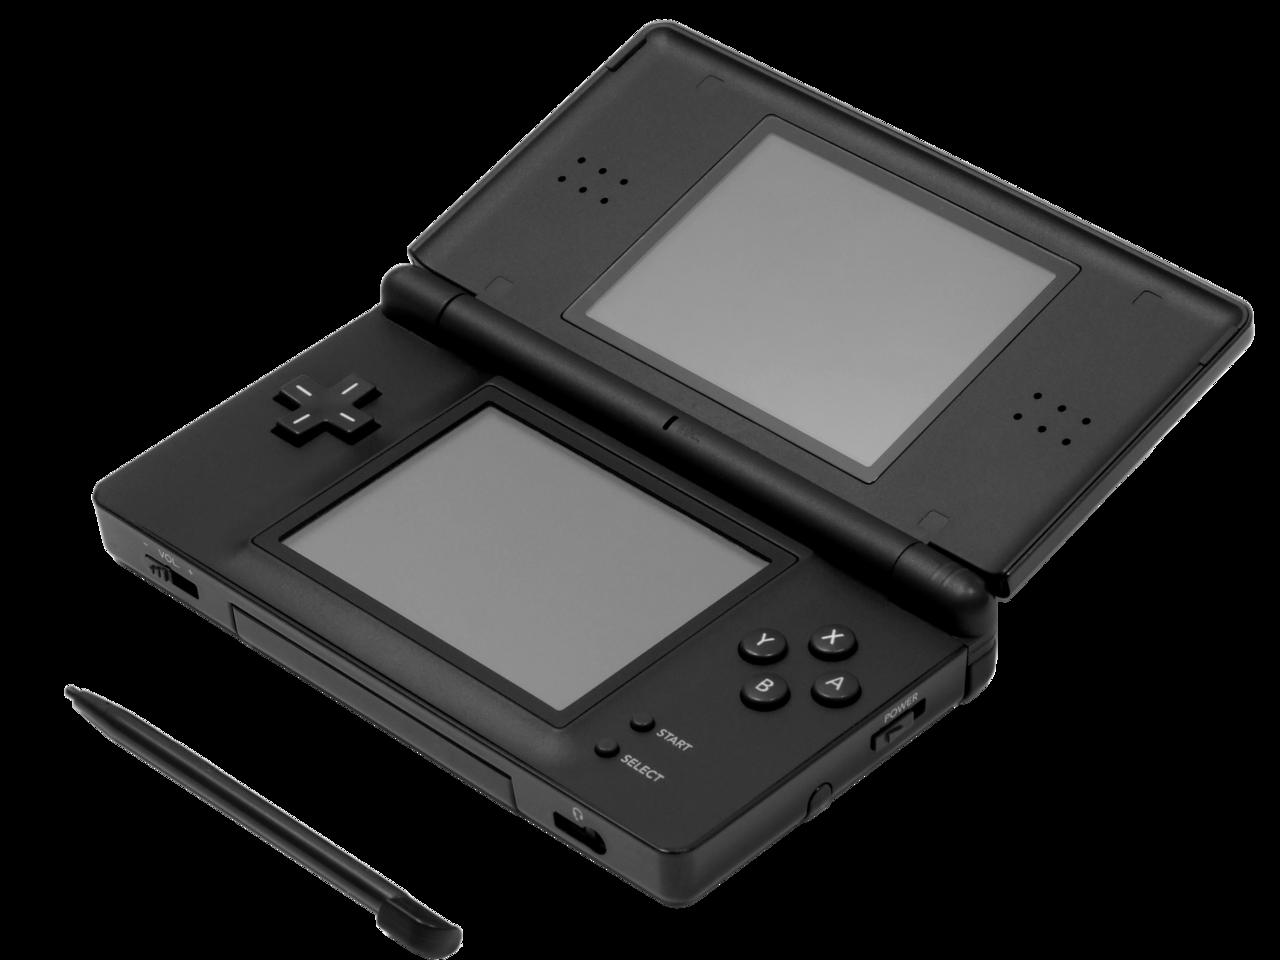 stylus Nintendo ds thumb